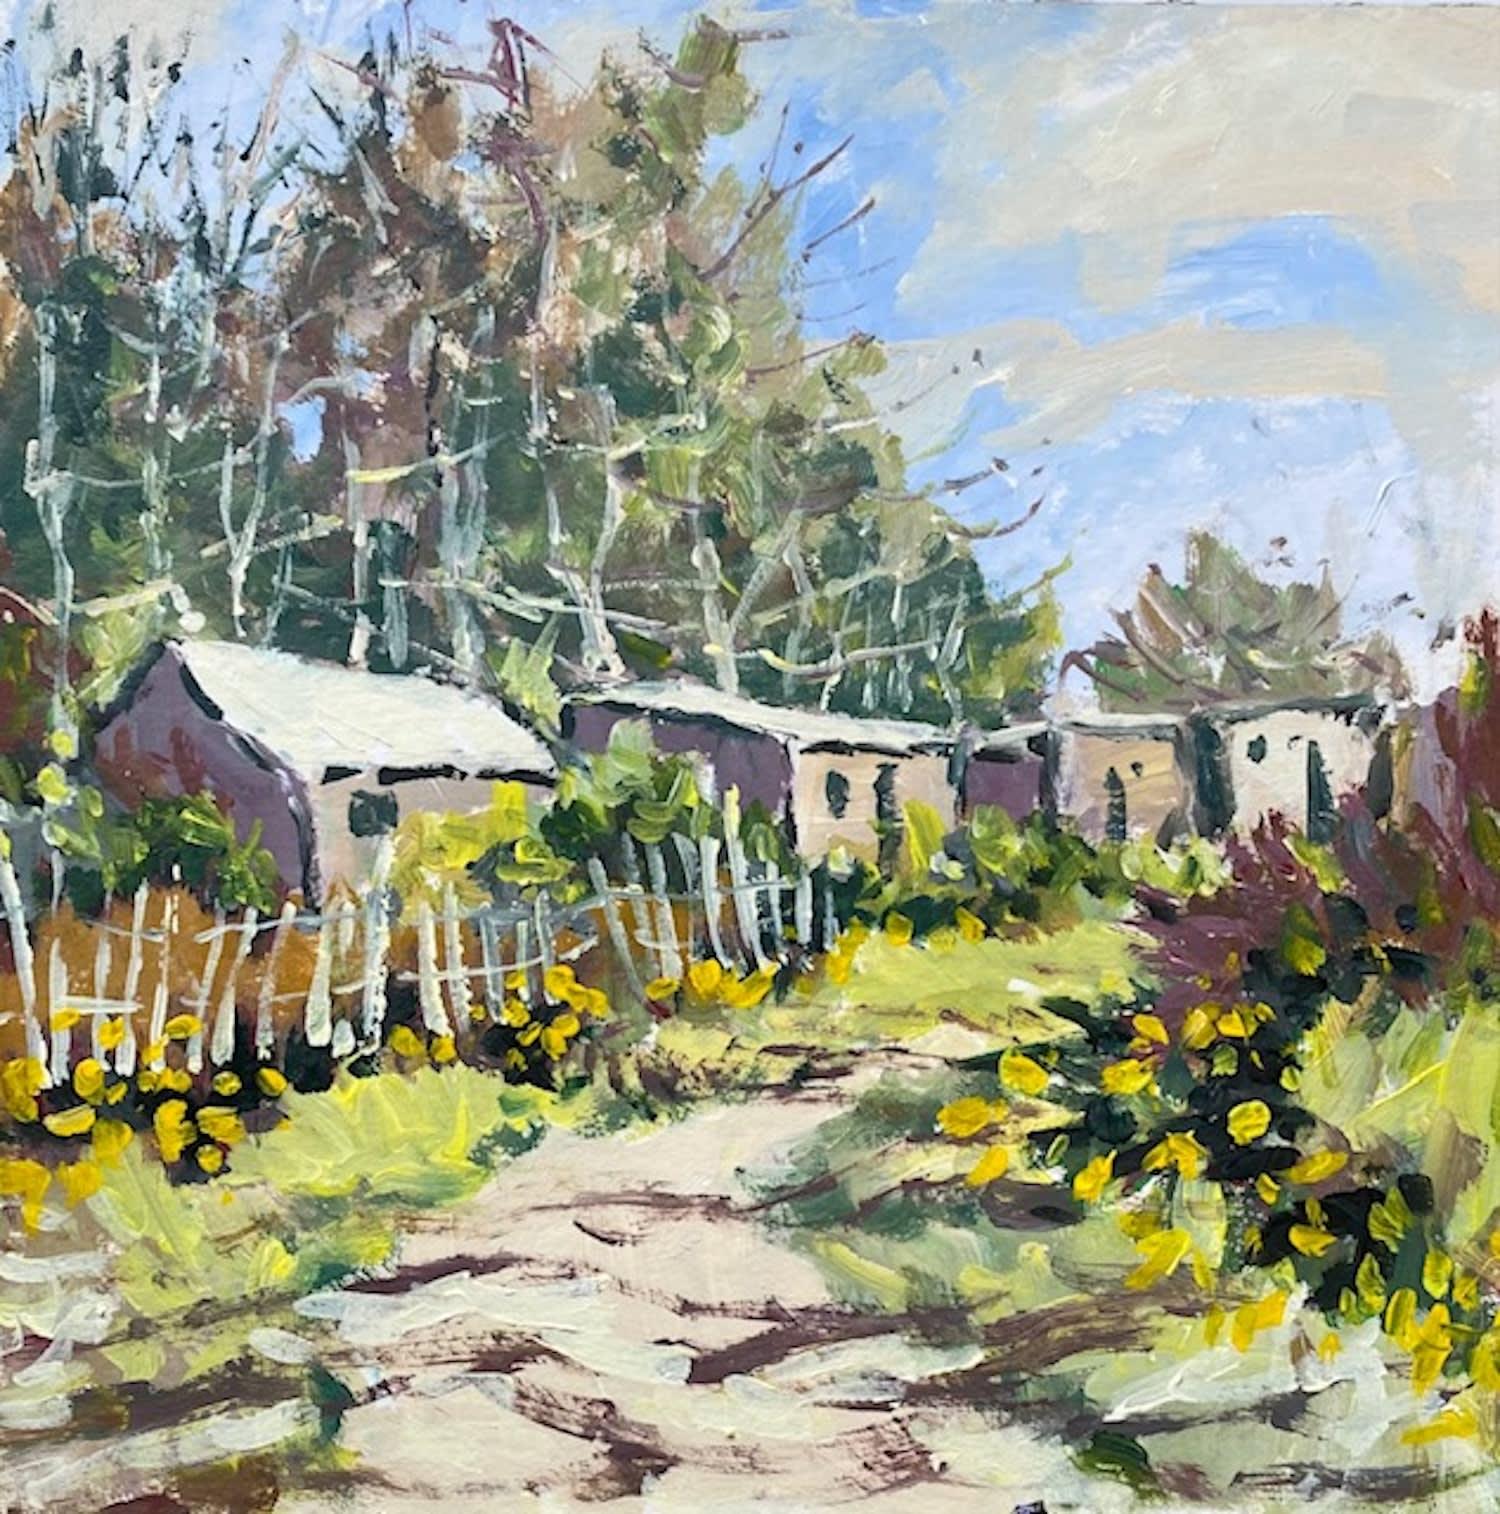 Kathleen Bremner, Garthdee Allotments, May